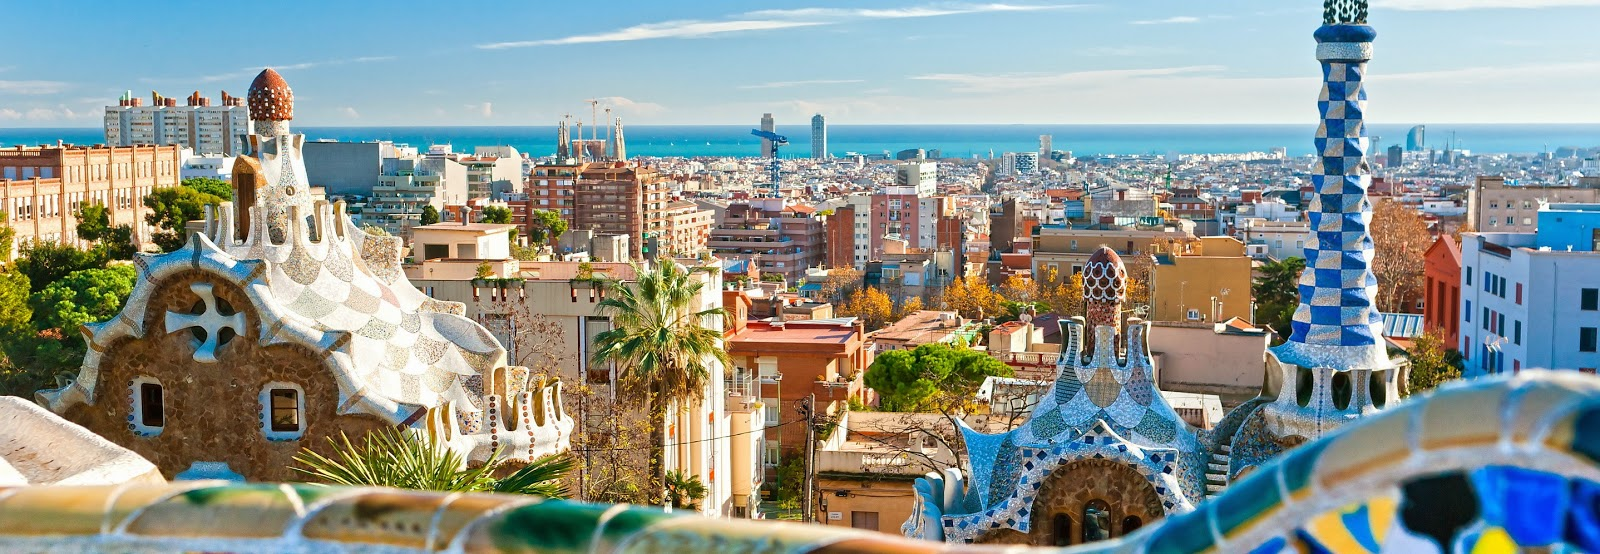 http://50crisis.blogspot.com.es/2014/08/agarra-las-maletas-nos-vamos-barcelona.html